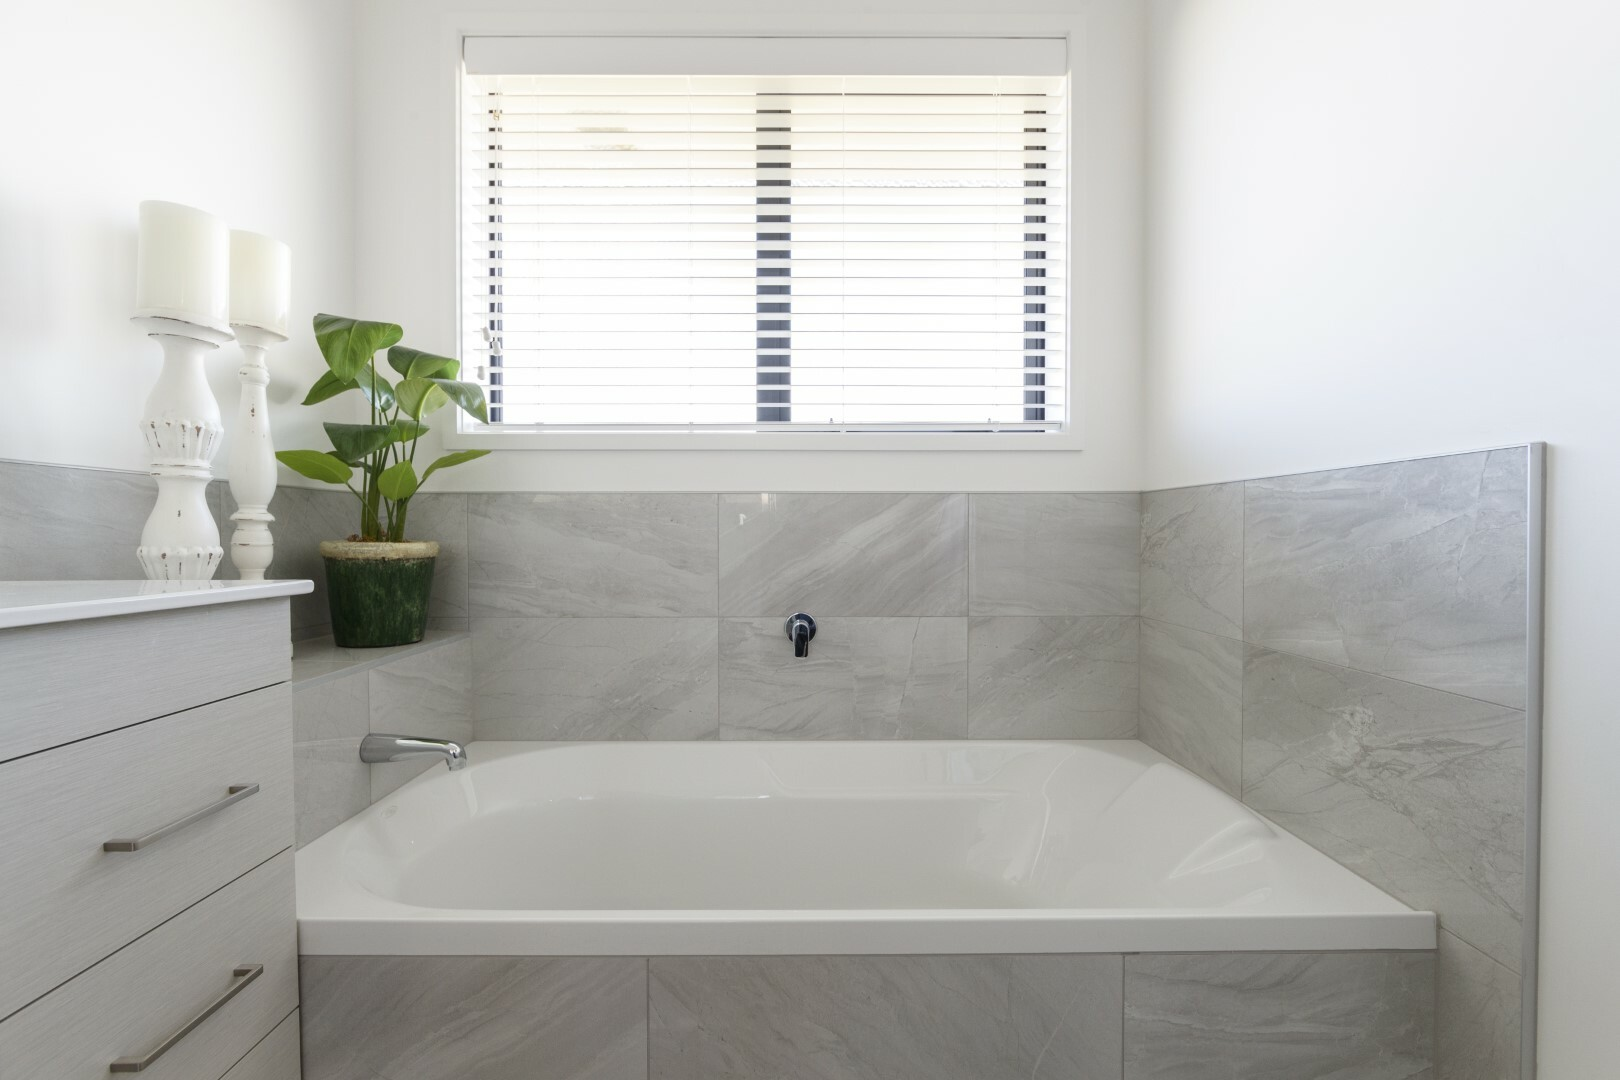 Top 5 Bathroom Trends For 2020 | Generation Homes Builders NZ